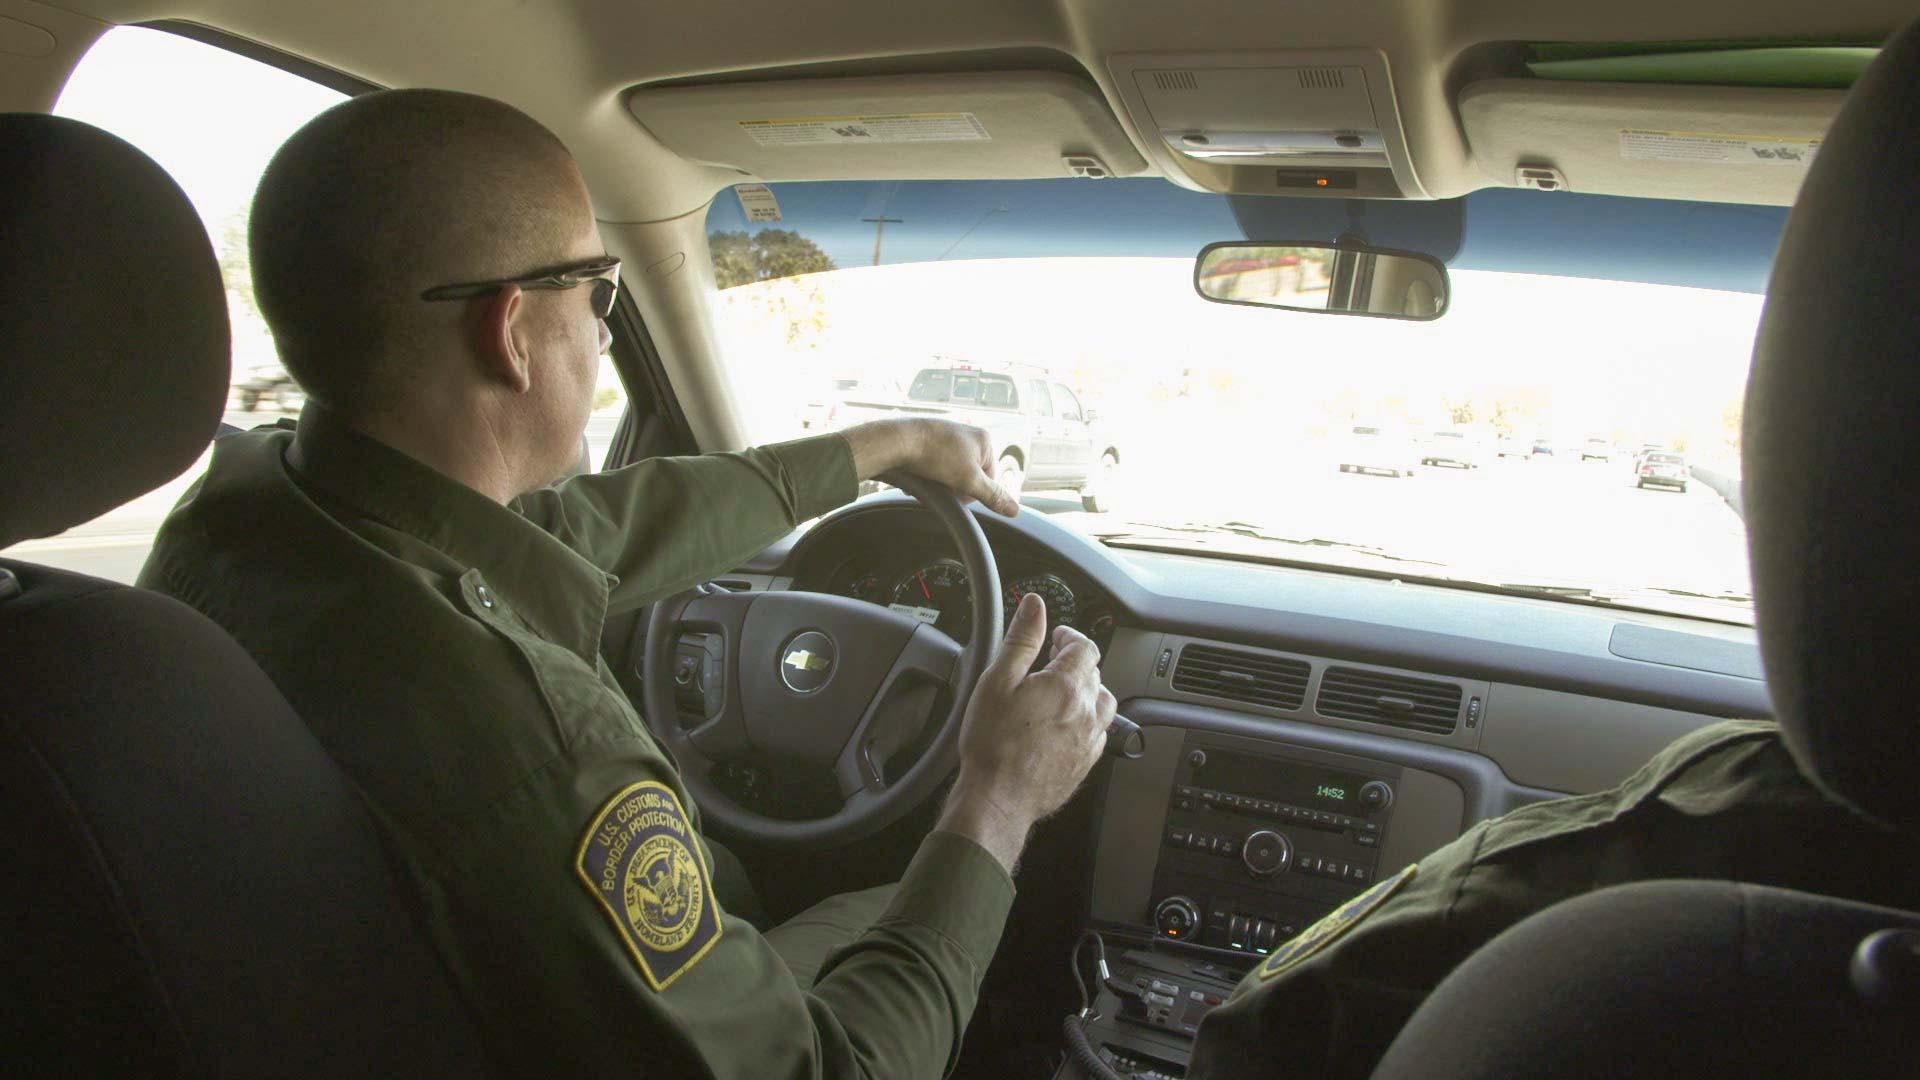 Tucson Sector Border Patrol agent Nick Robbs